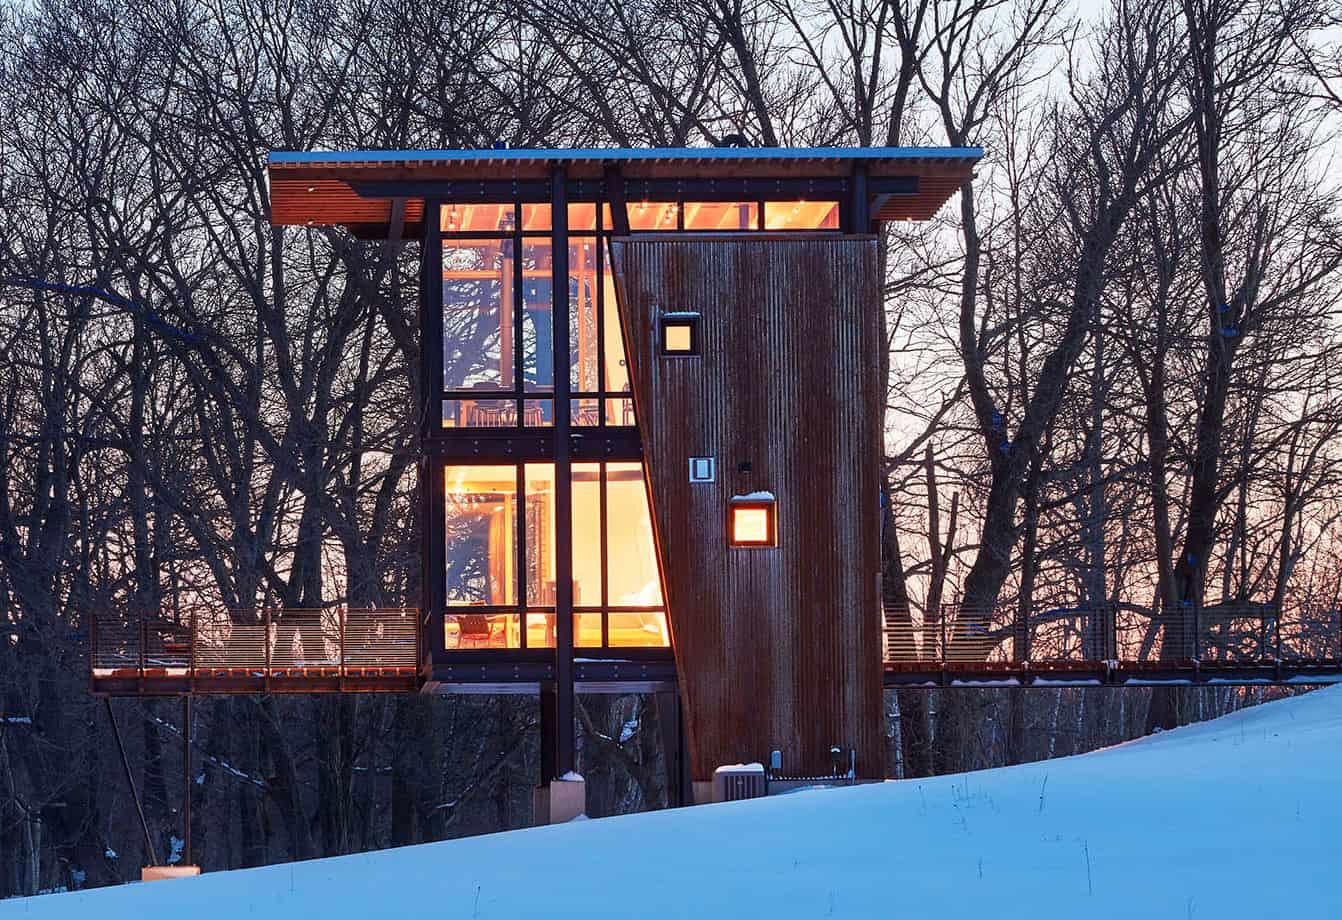 Escape into nature in this serene Wisconsin cabin: MetalLark Tower